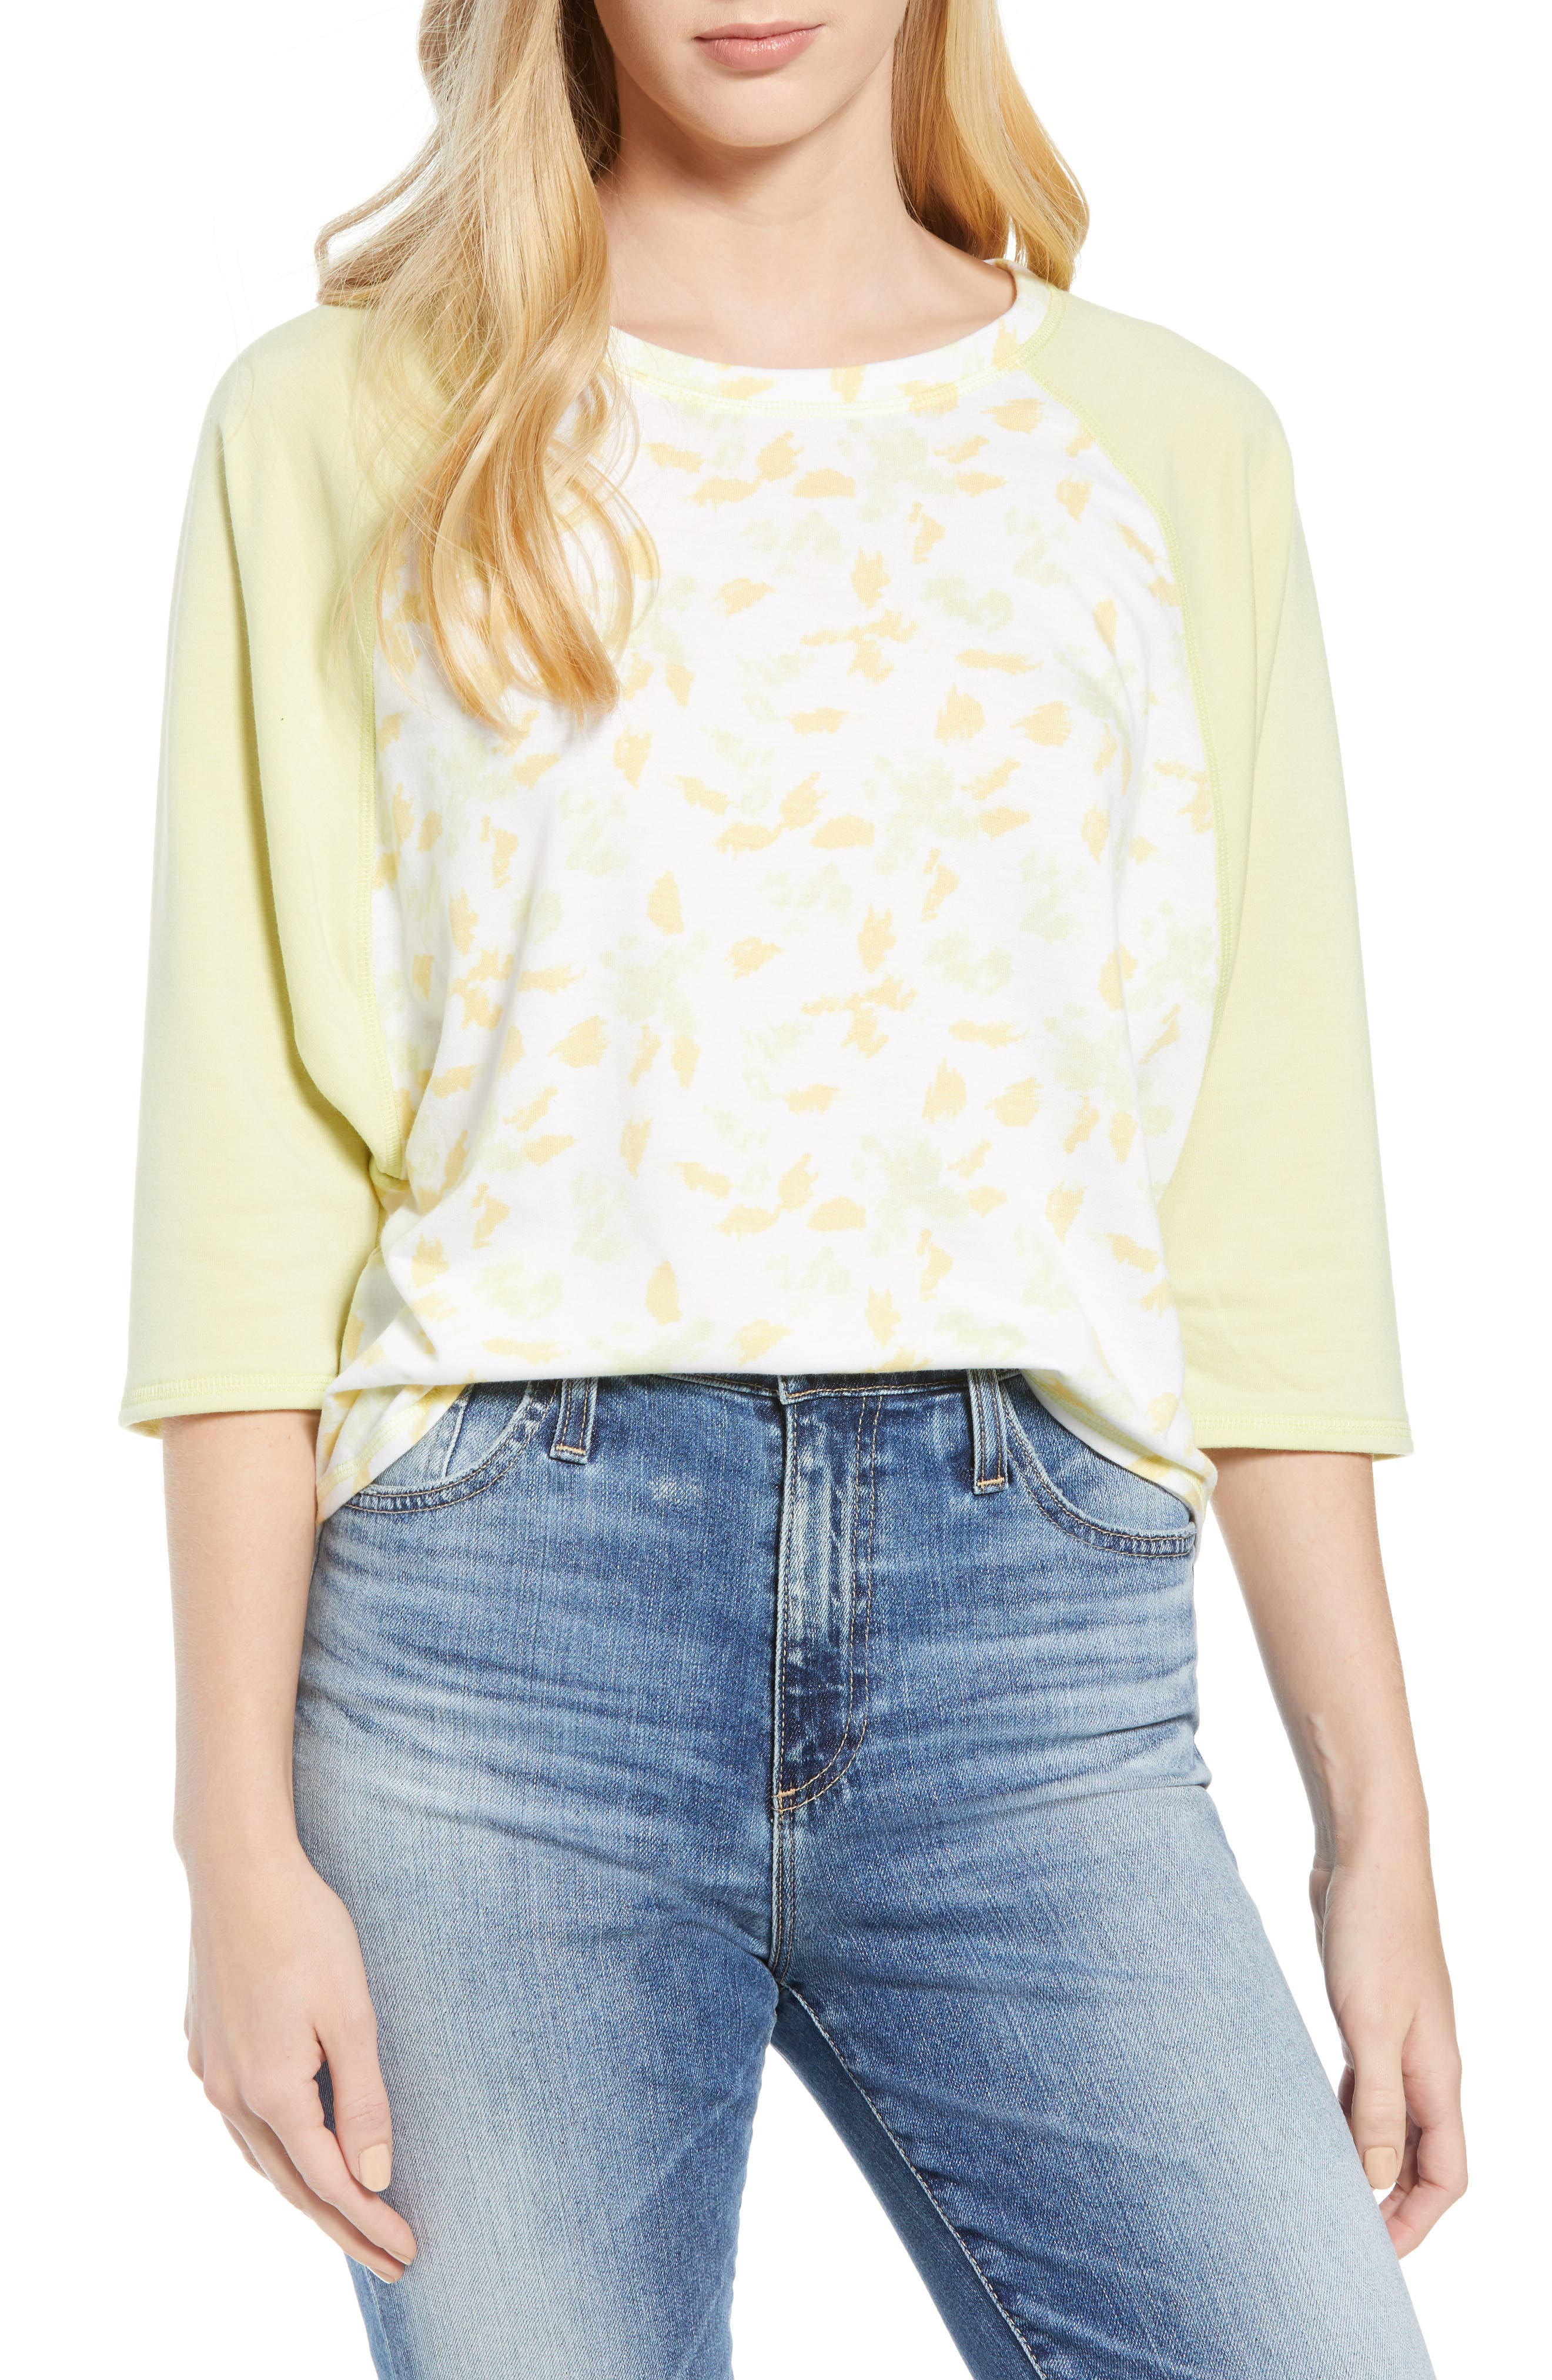 Off Duty Raglan Sleeve Sweatshirt,                             Main thumbnail 1, color,                             Ivory- Yellow Fleurs De Laine